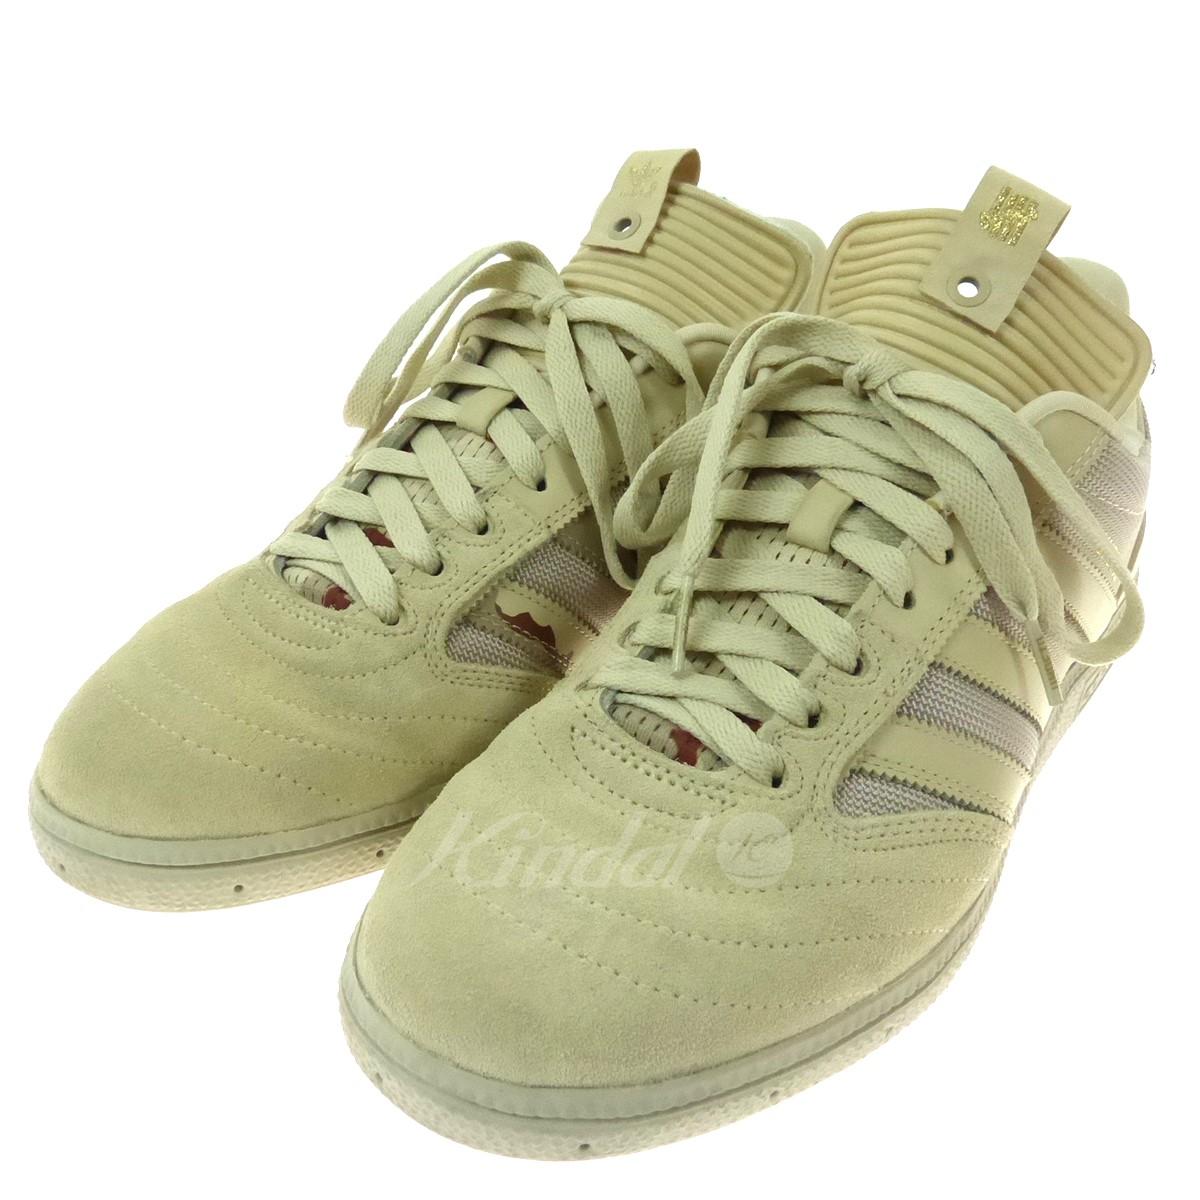 53e77de8879 adidas Consortium X UNDEFEATED BUSENITZ UNDFTD sneakers light beige size  26  5cm (Adidas consortium)